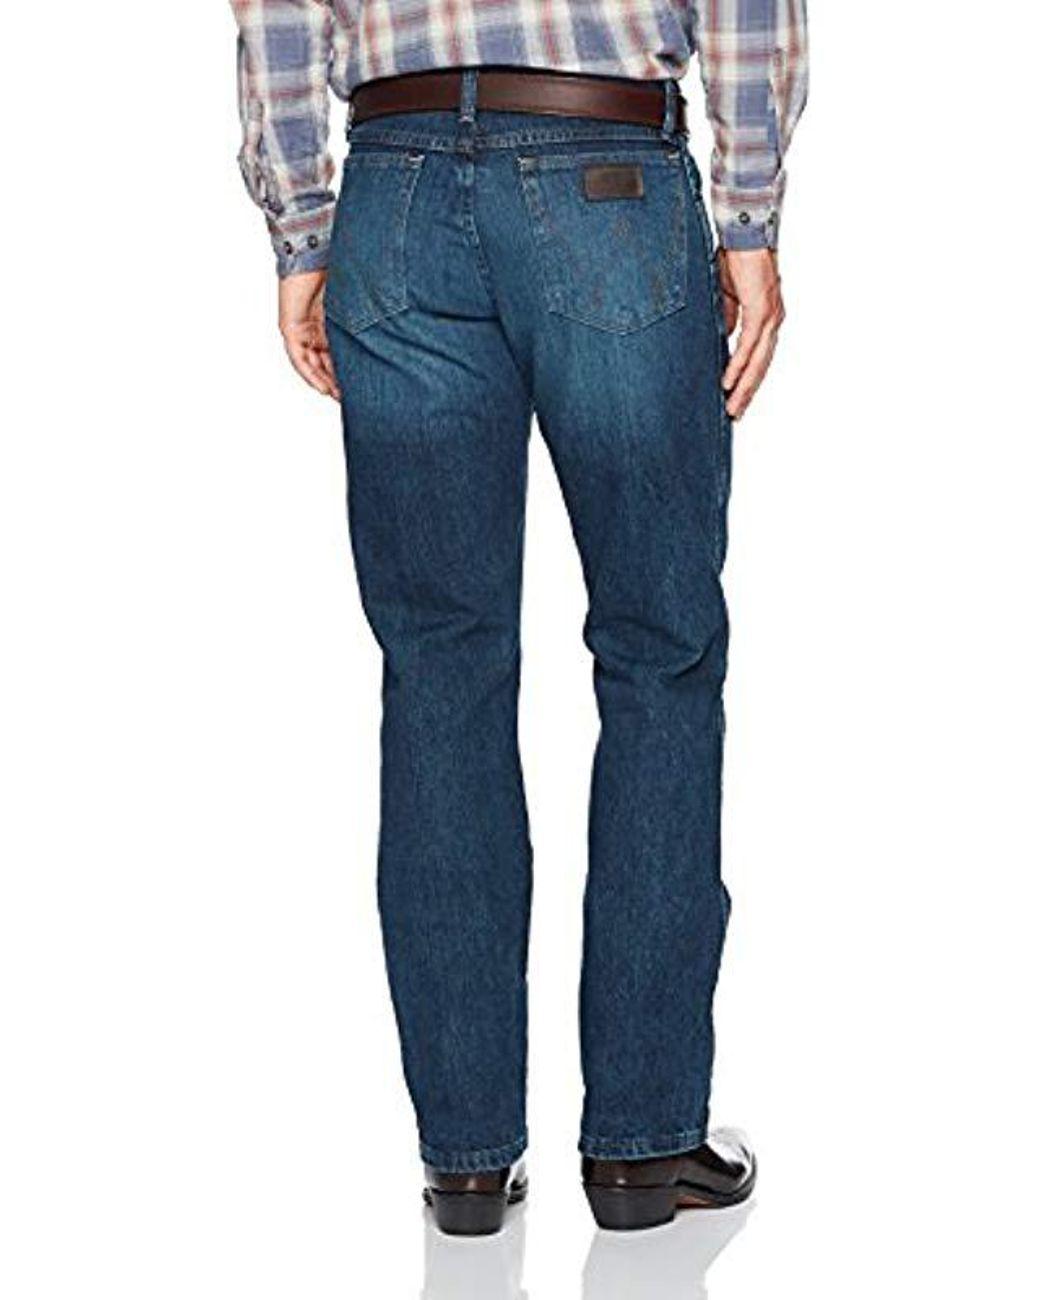 Wrangler Mens PBR Vintage Boot Cut Jean